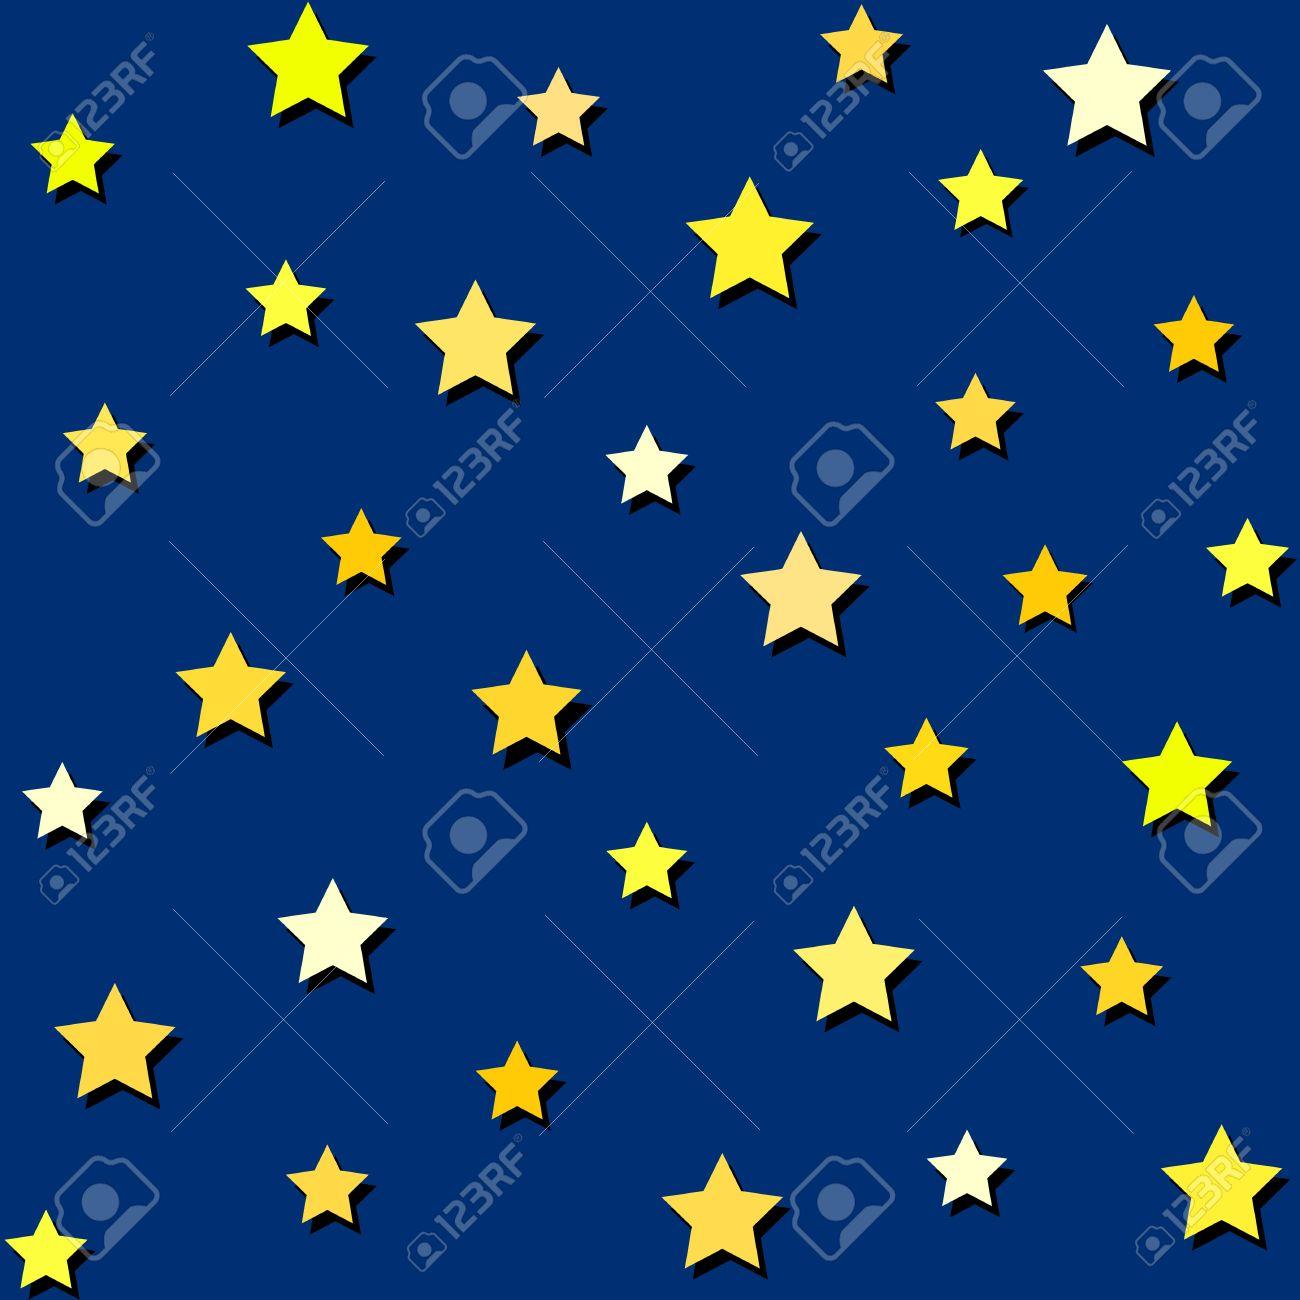 night sky and yellow stars seamless background royalty free rh 123rf com starry night sky vector star night sky vector